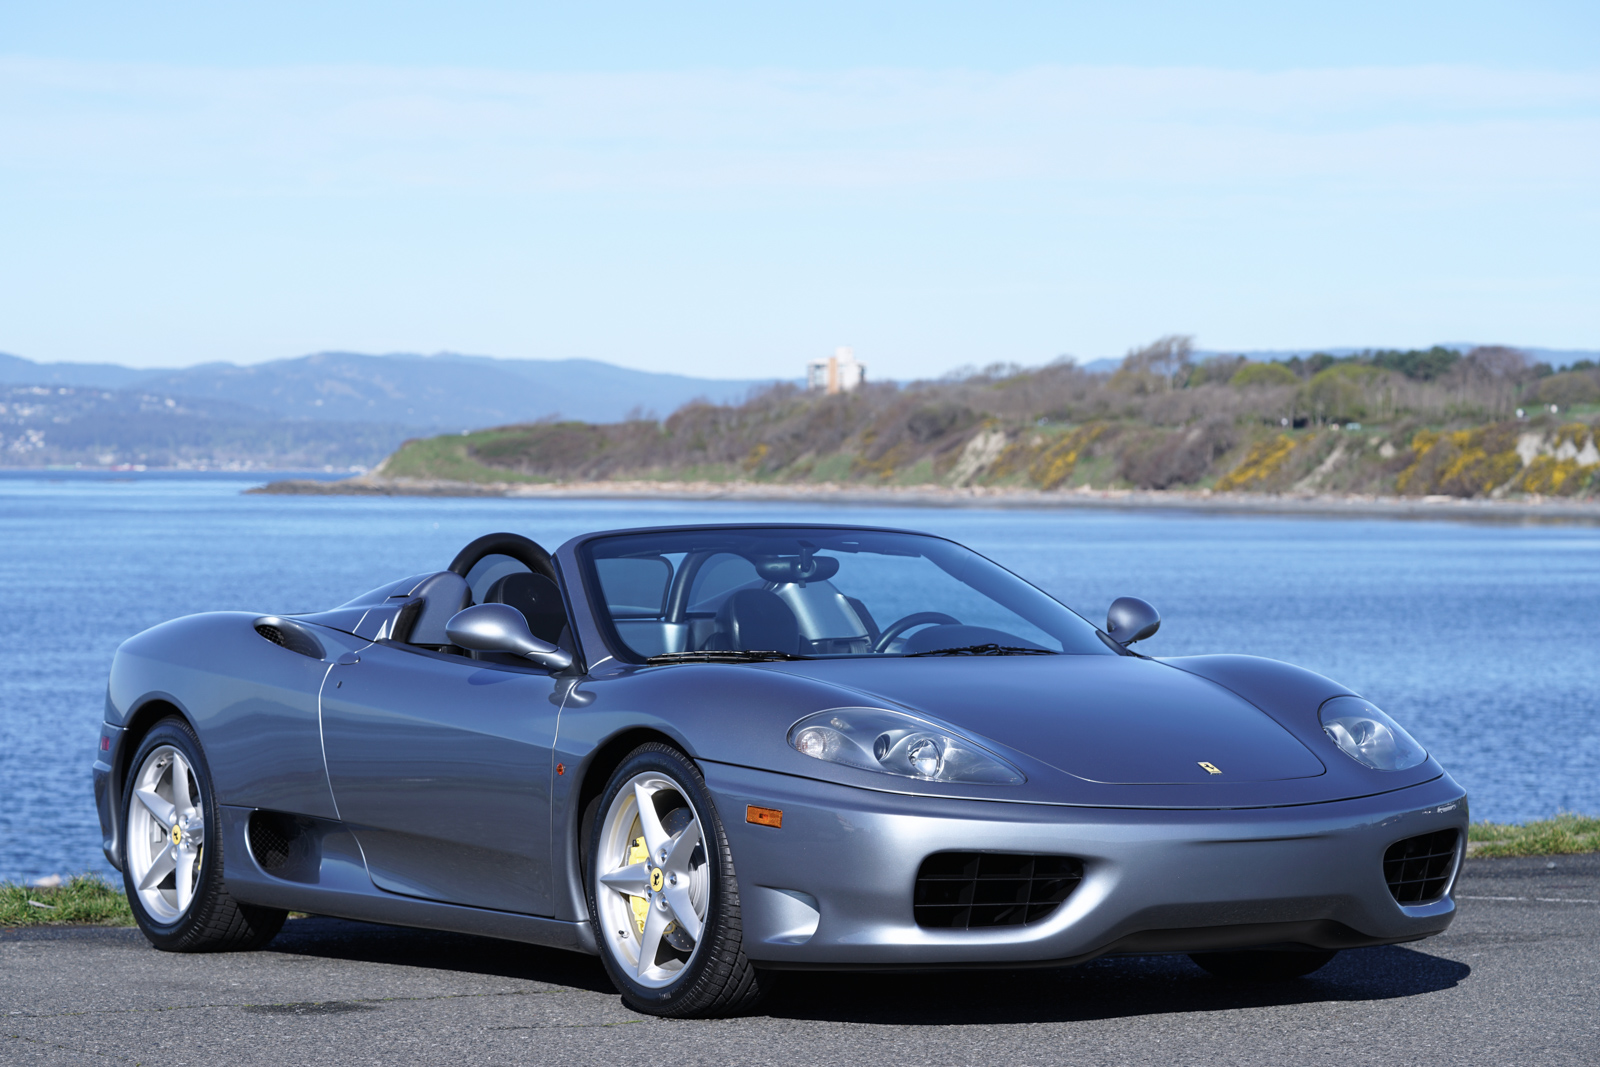 2002 Ferrari 360 Spider 6-Speed Manual for sale